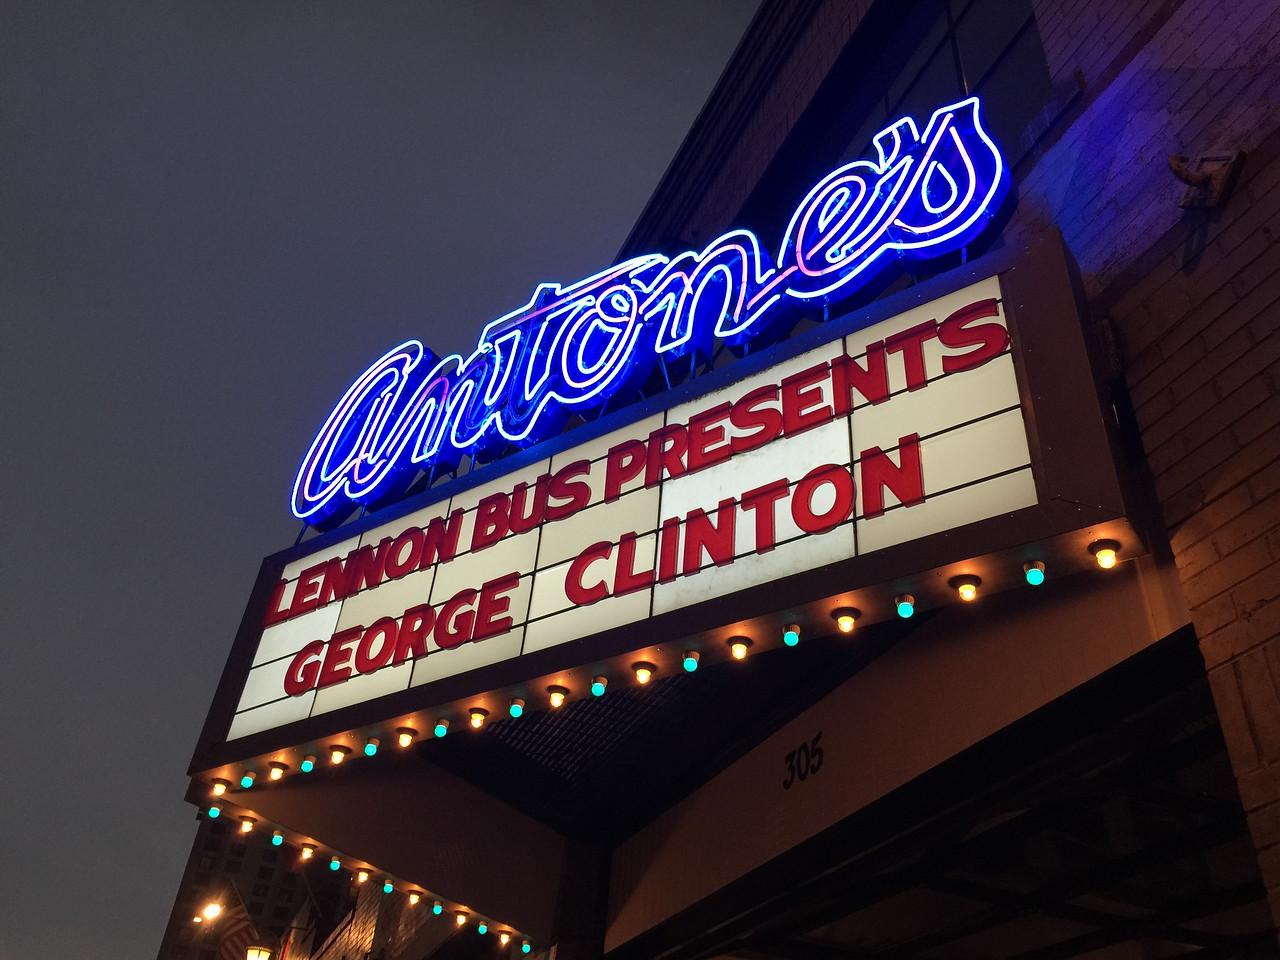 2016_03_18, Austin, TX, George Clinton, Antones